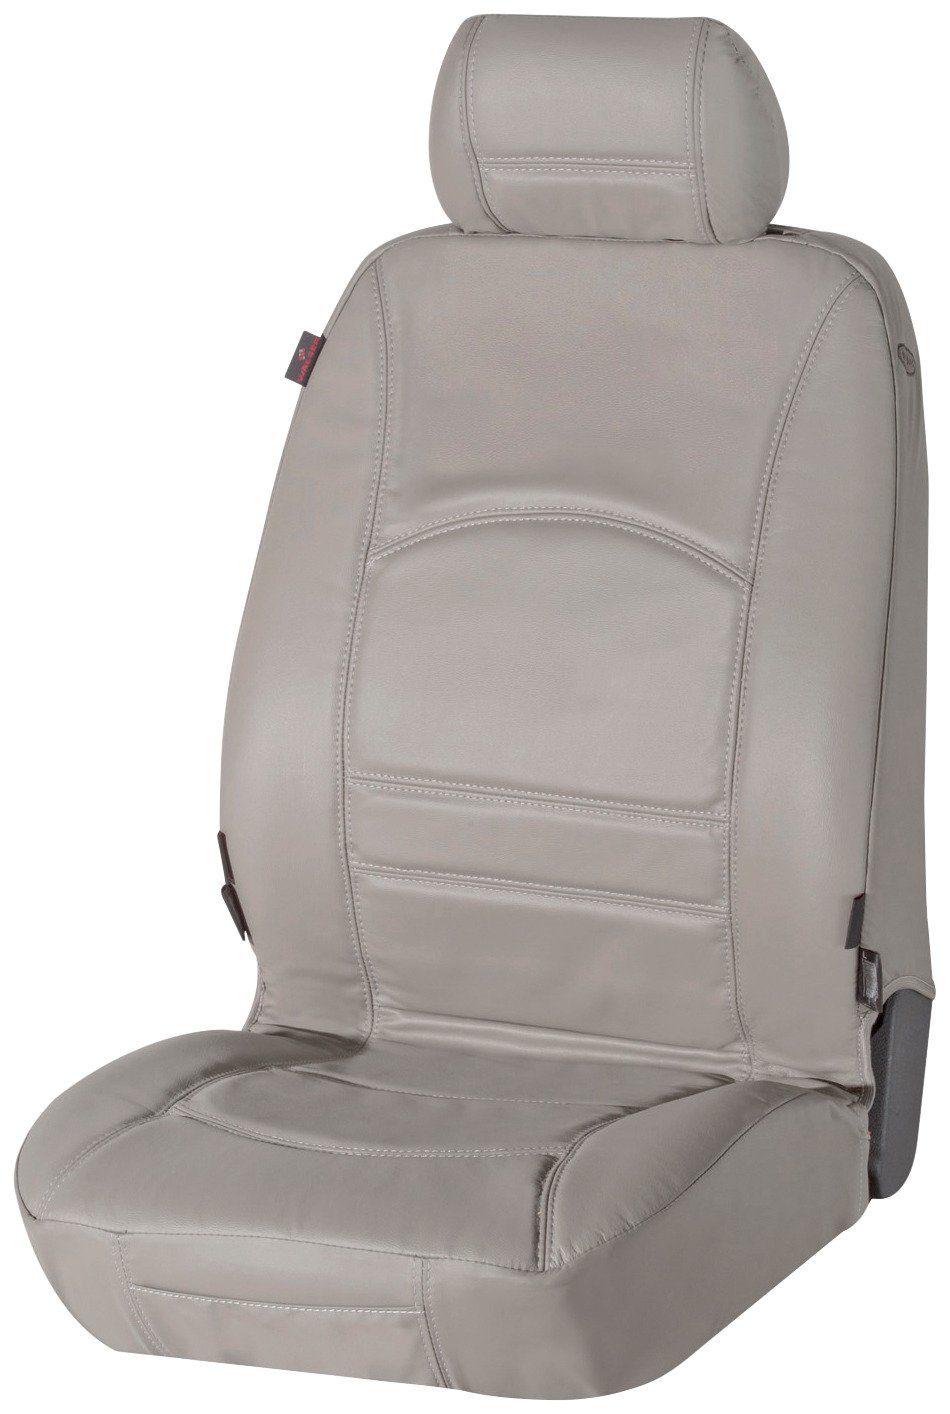 Walser Autositzbezug »Ranger grau«